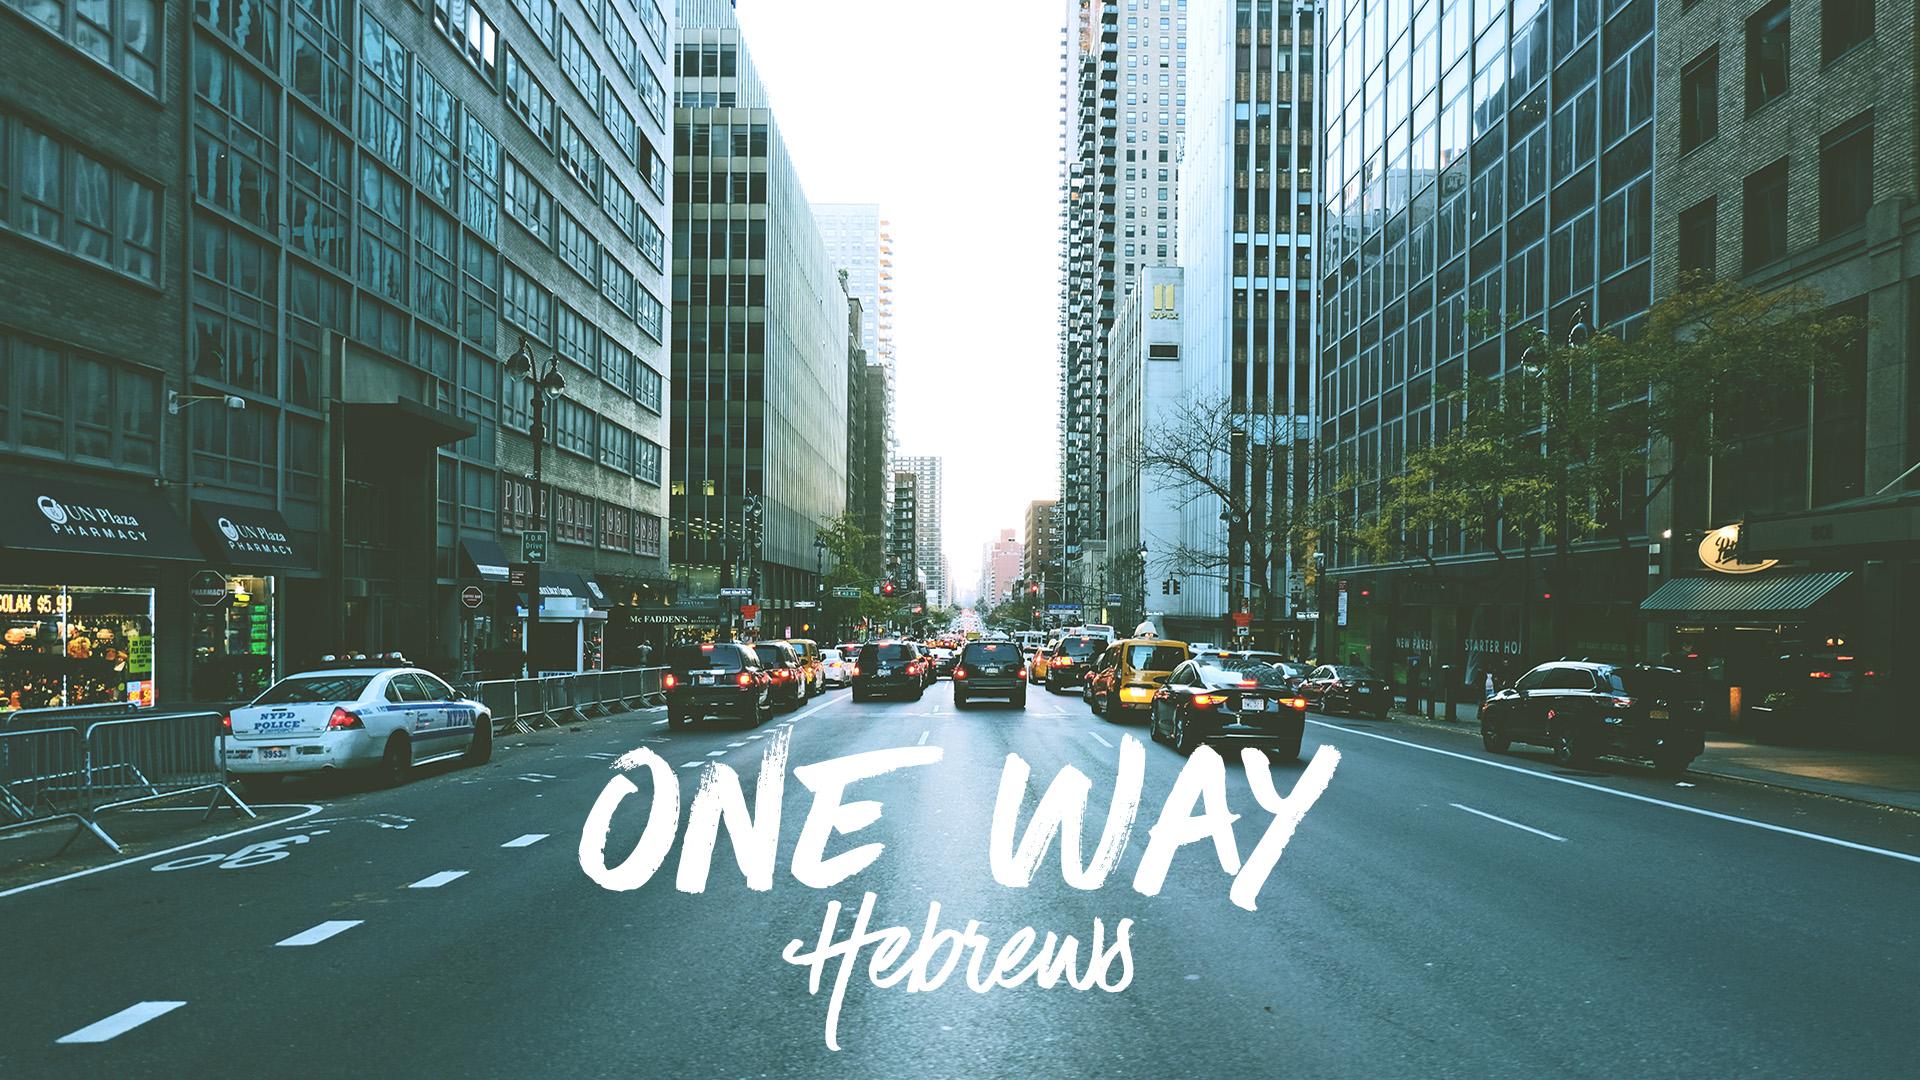 One Way: Studies In Hebrews